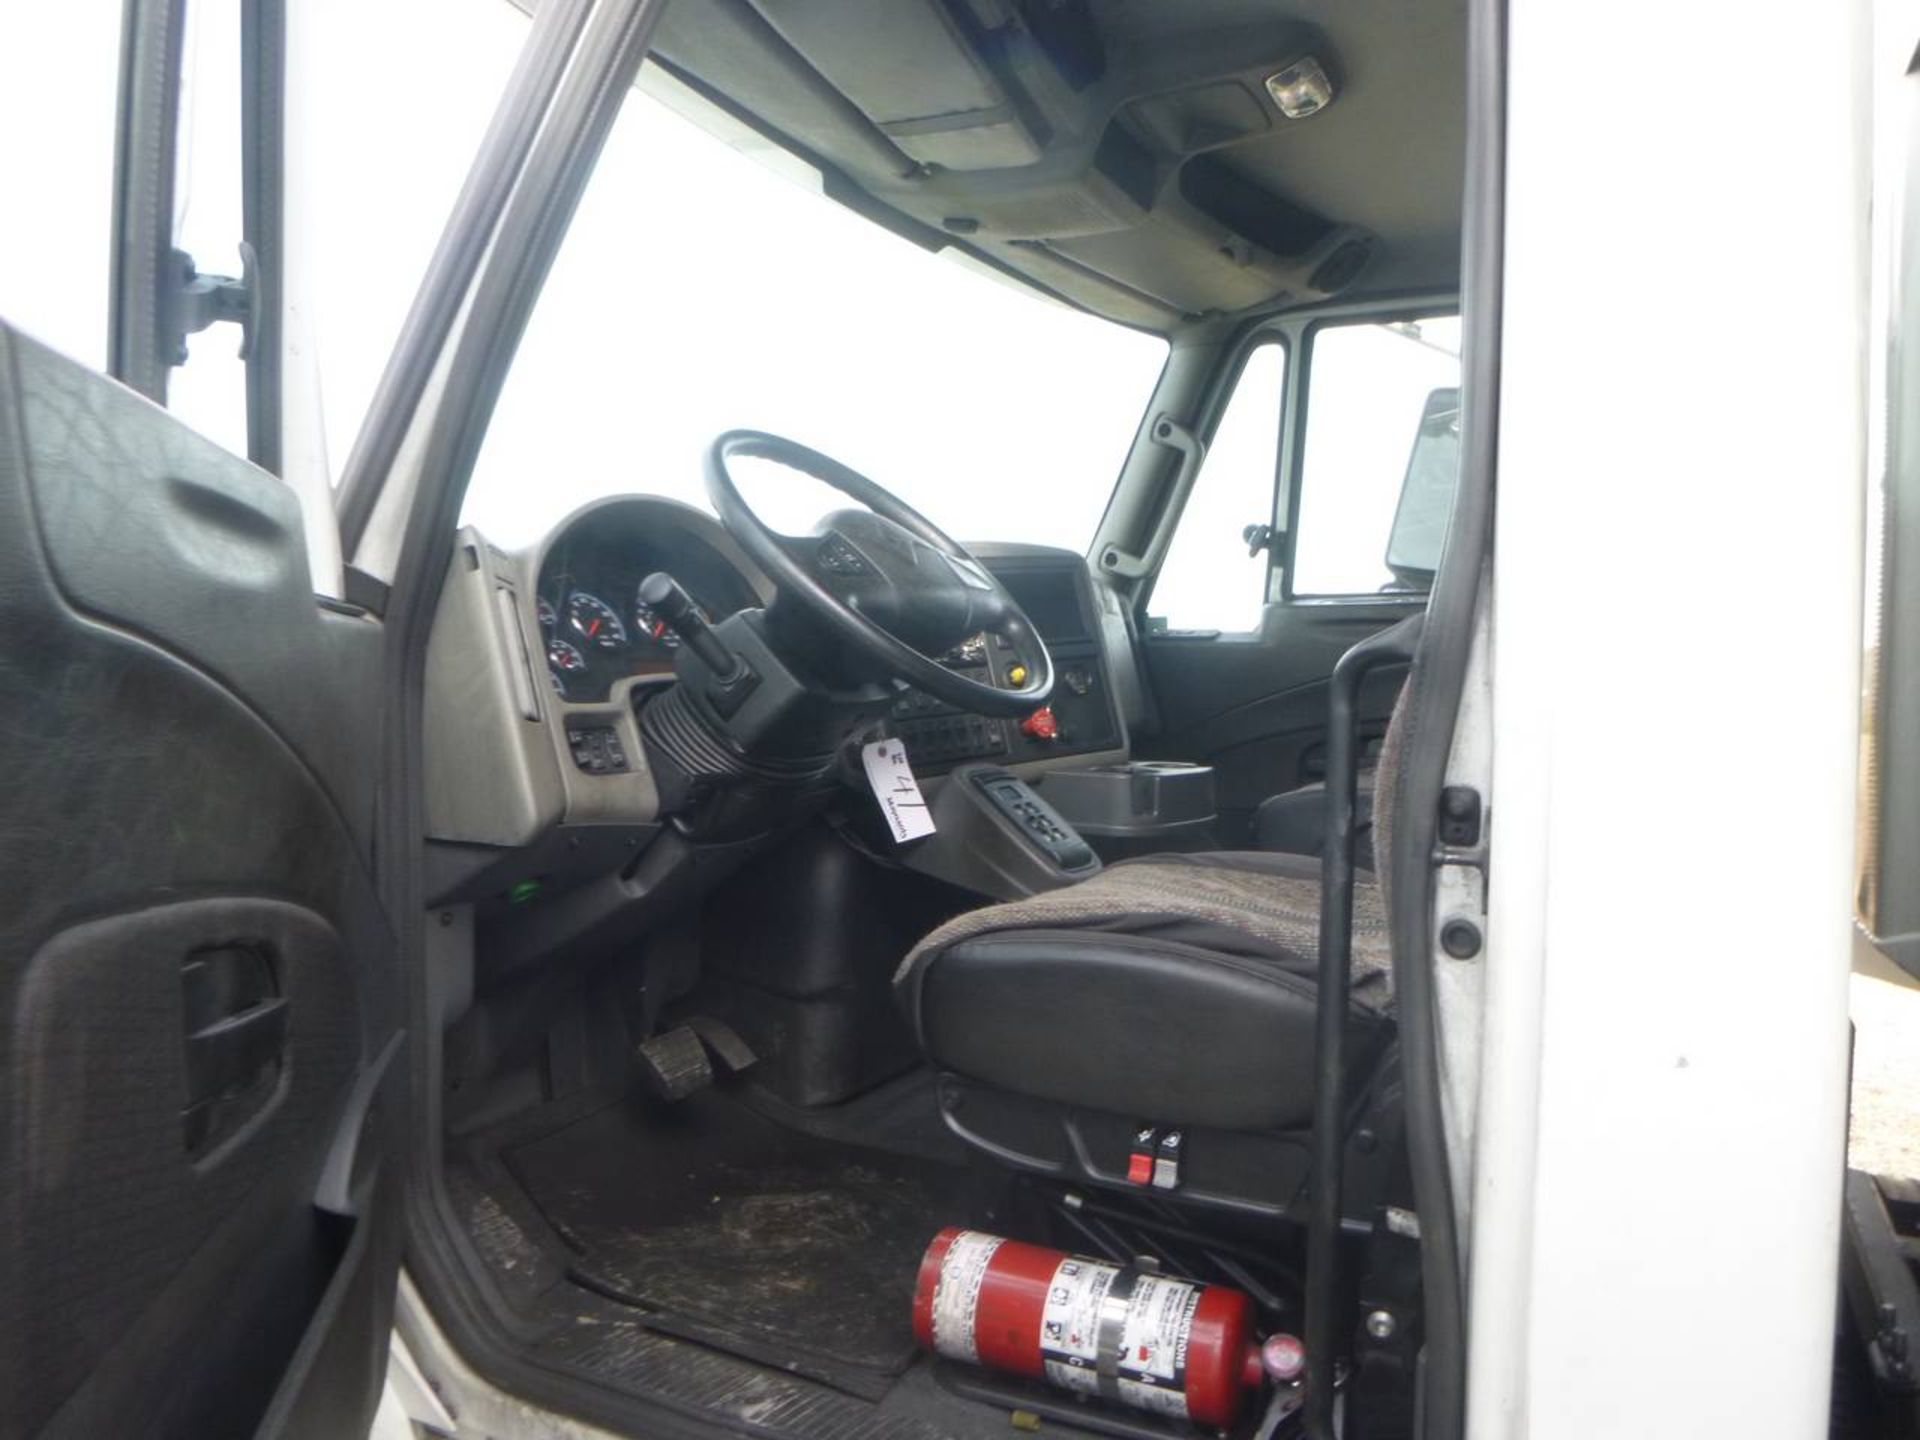 2018 International 4400 SBA 6X4 Dump Truck - Image 6 of 15